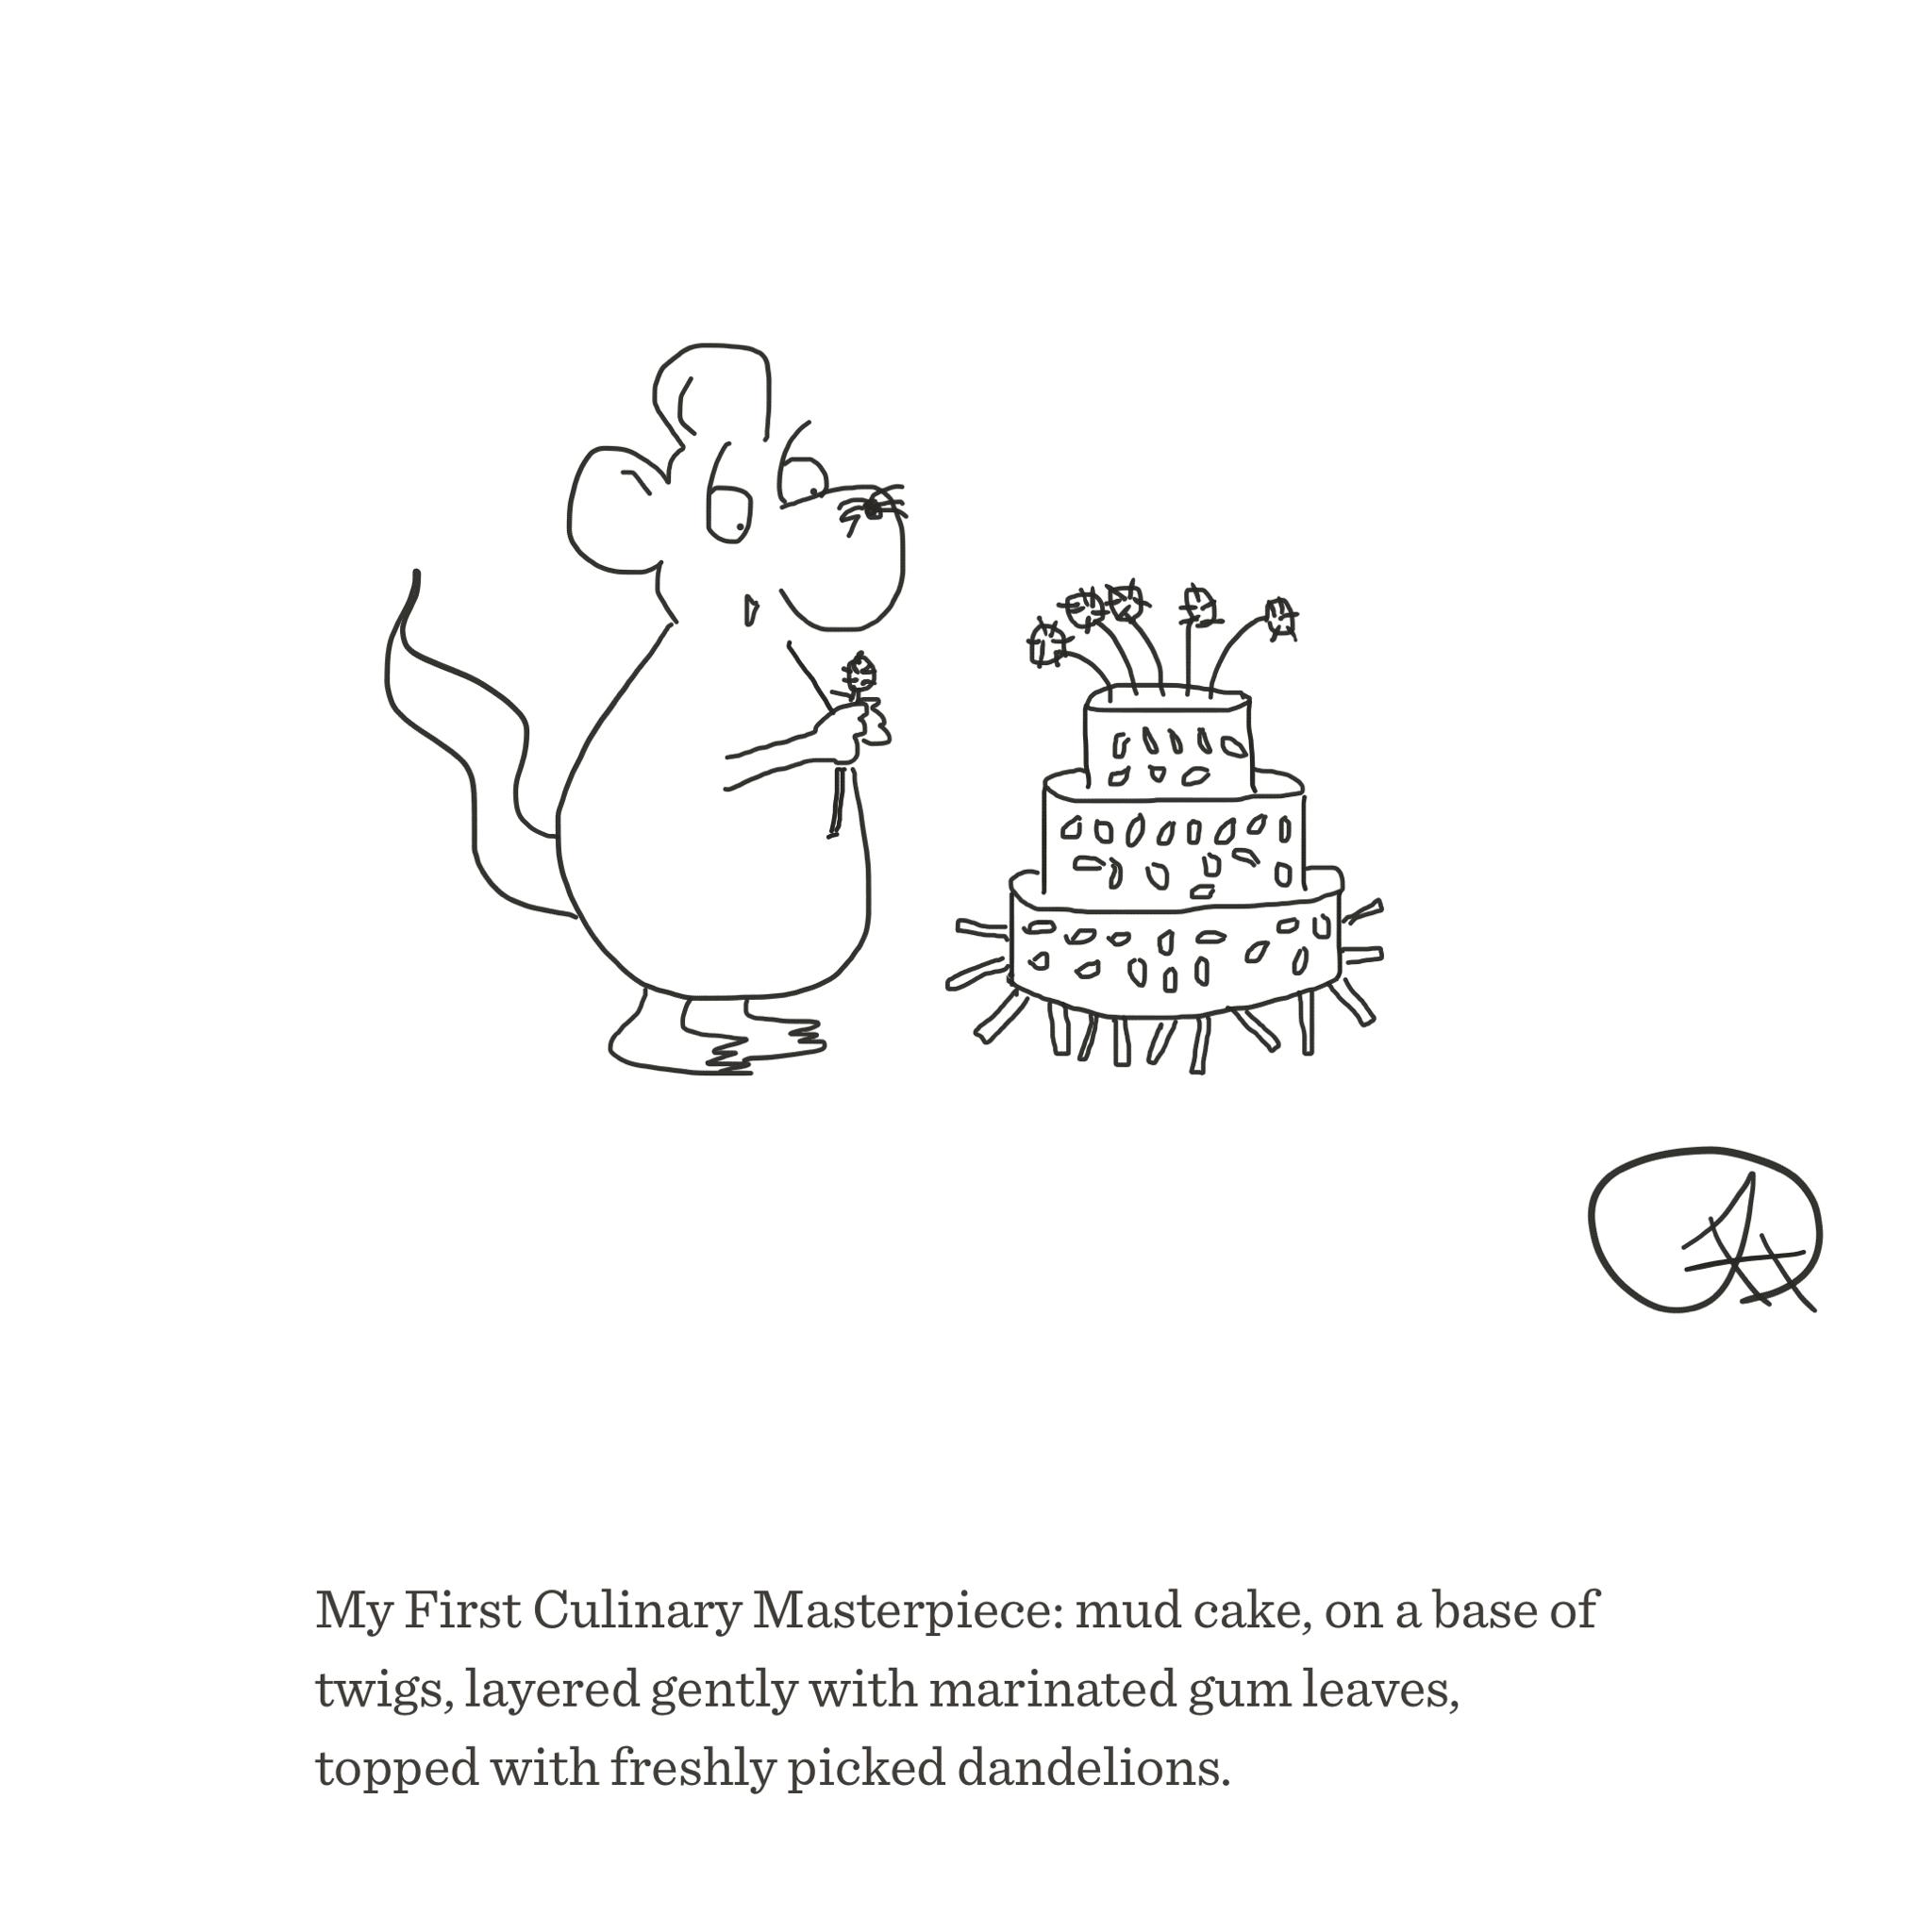 Mud cake masterpiece, The Happy Rat cartoon